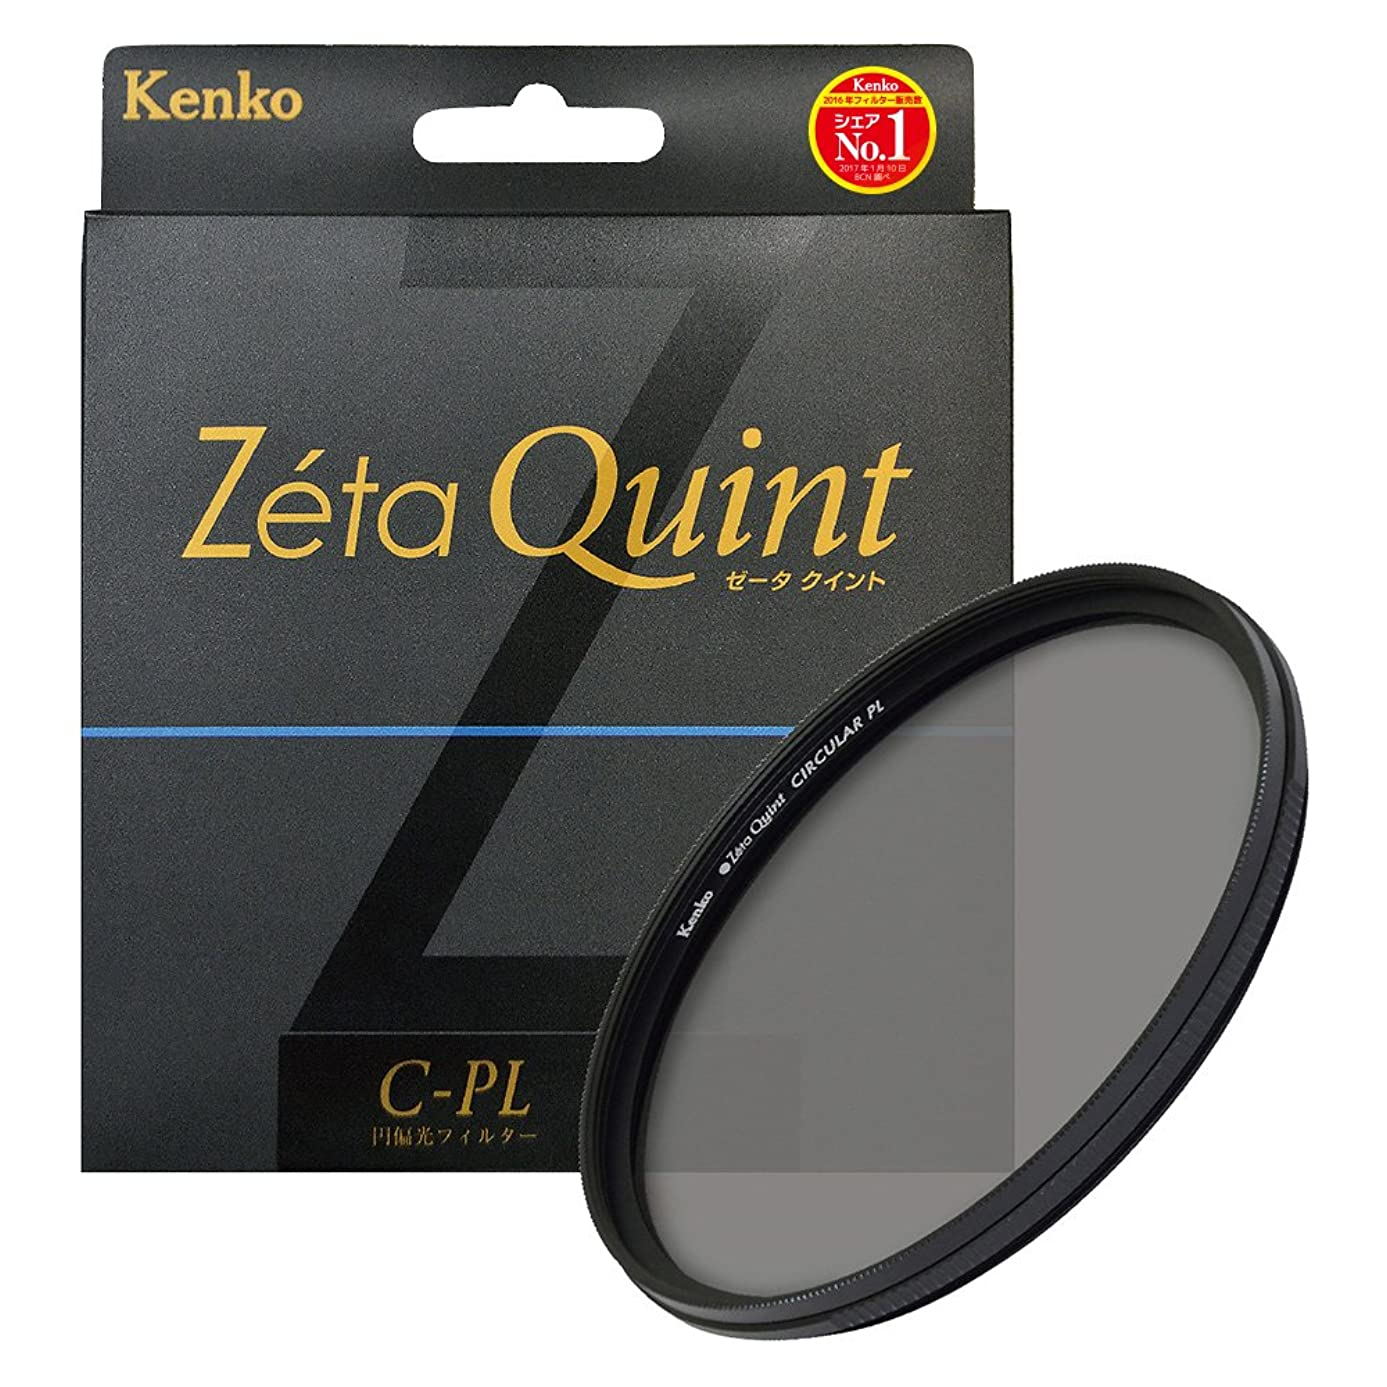 Kenko 52mm Zeta Quint Circular Polarizer (C-PL) - Zr-Coated, Slim Frame, Tempered Glass - Finest Camera Lens Filters